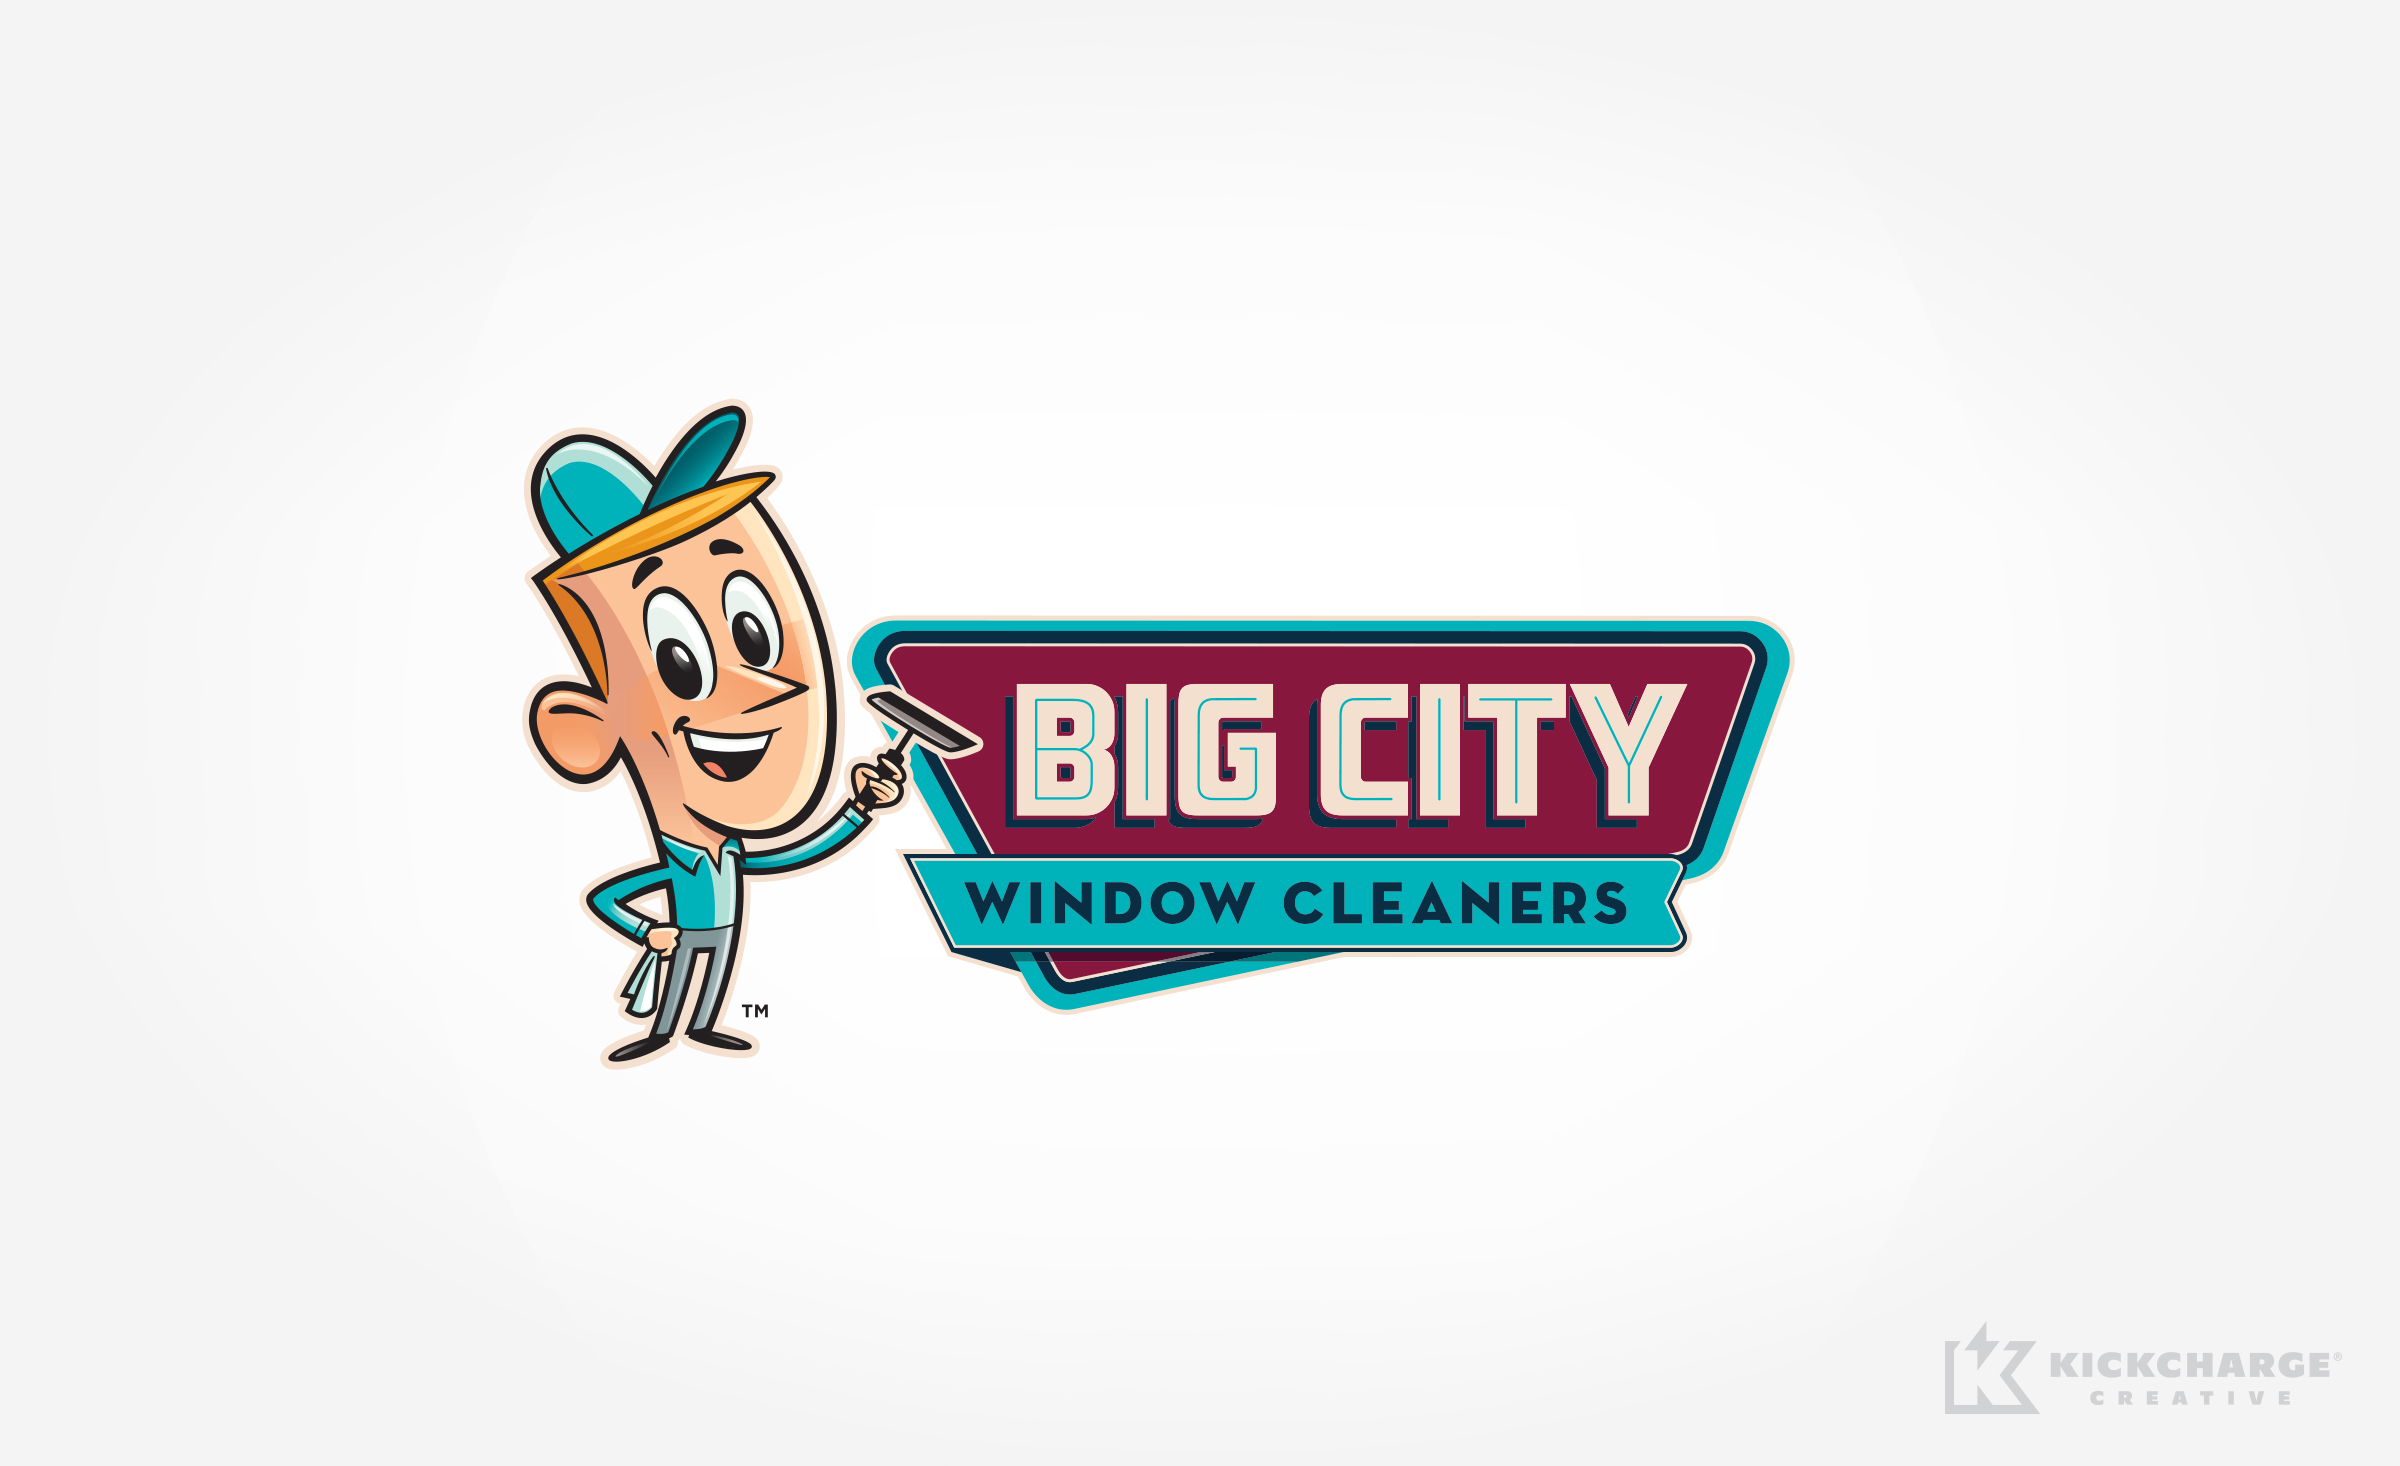 Big City Window Cleaners